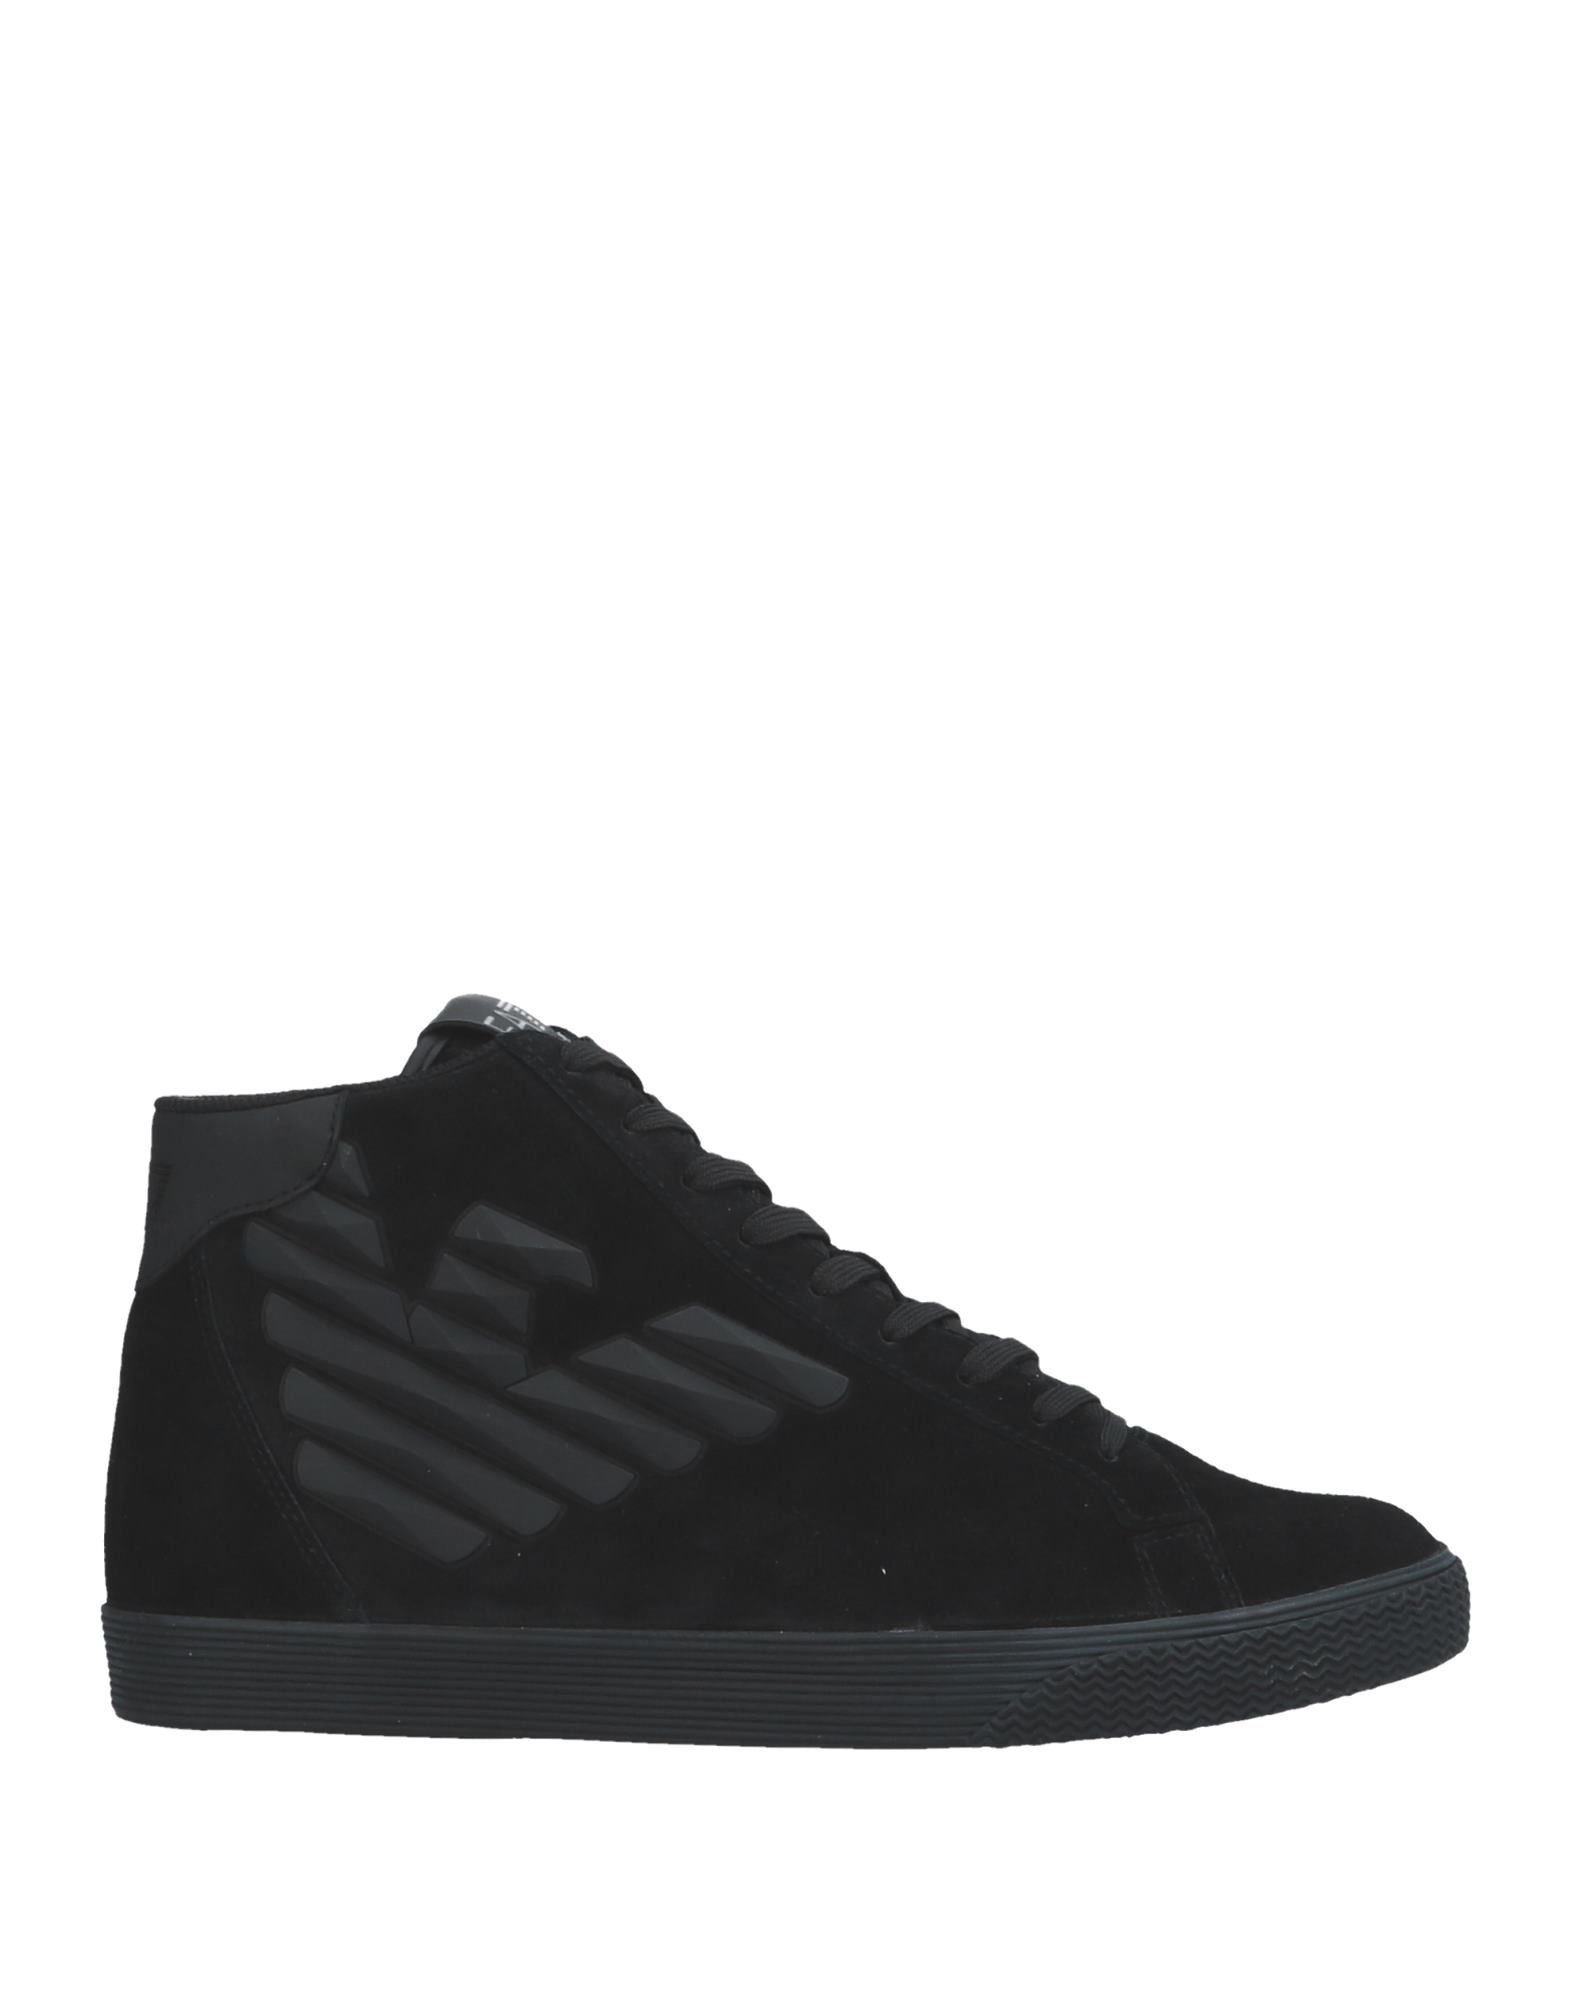 Ea7 11511397JC Sneakers Herren  11511397JC Ea7 Gute Qualität beliebte Schuhe 040b1a